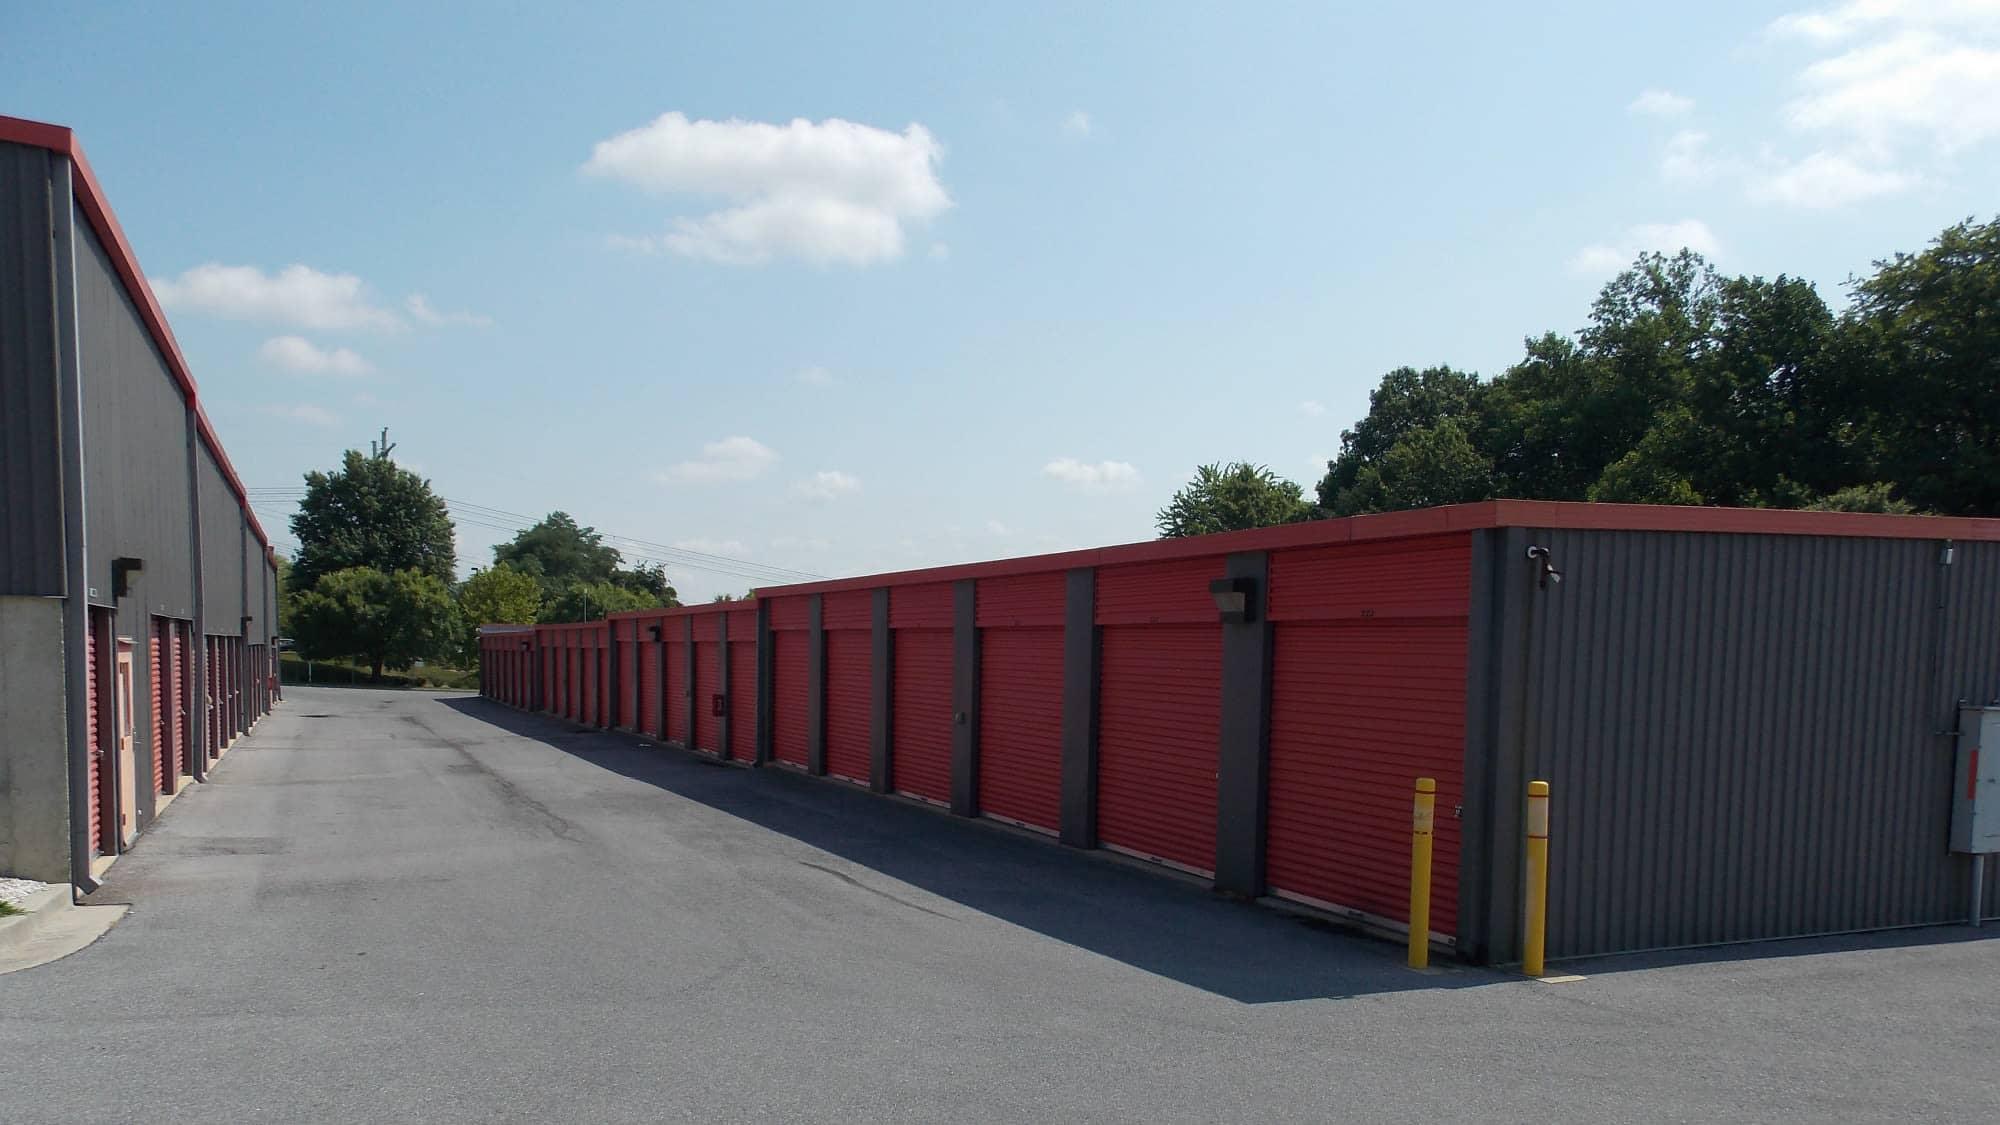 Ground-level units at Freestate Self Storage in Laurel, Maryland